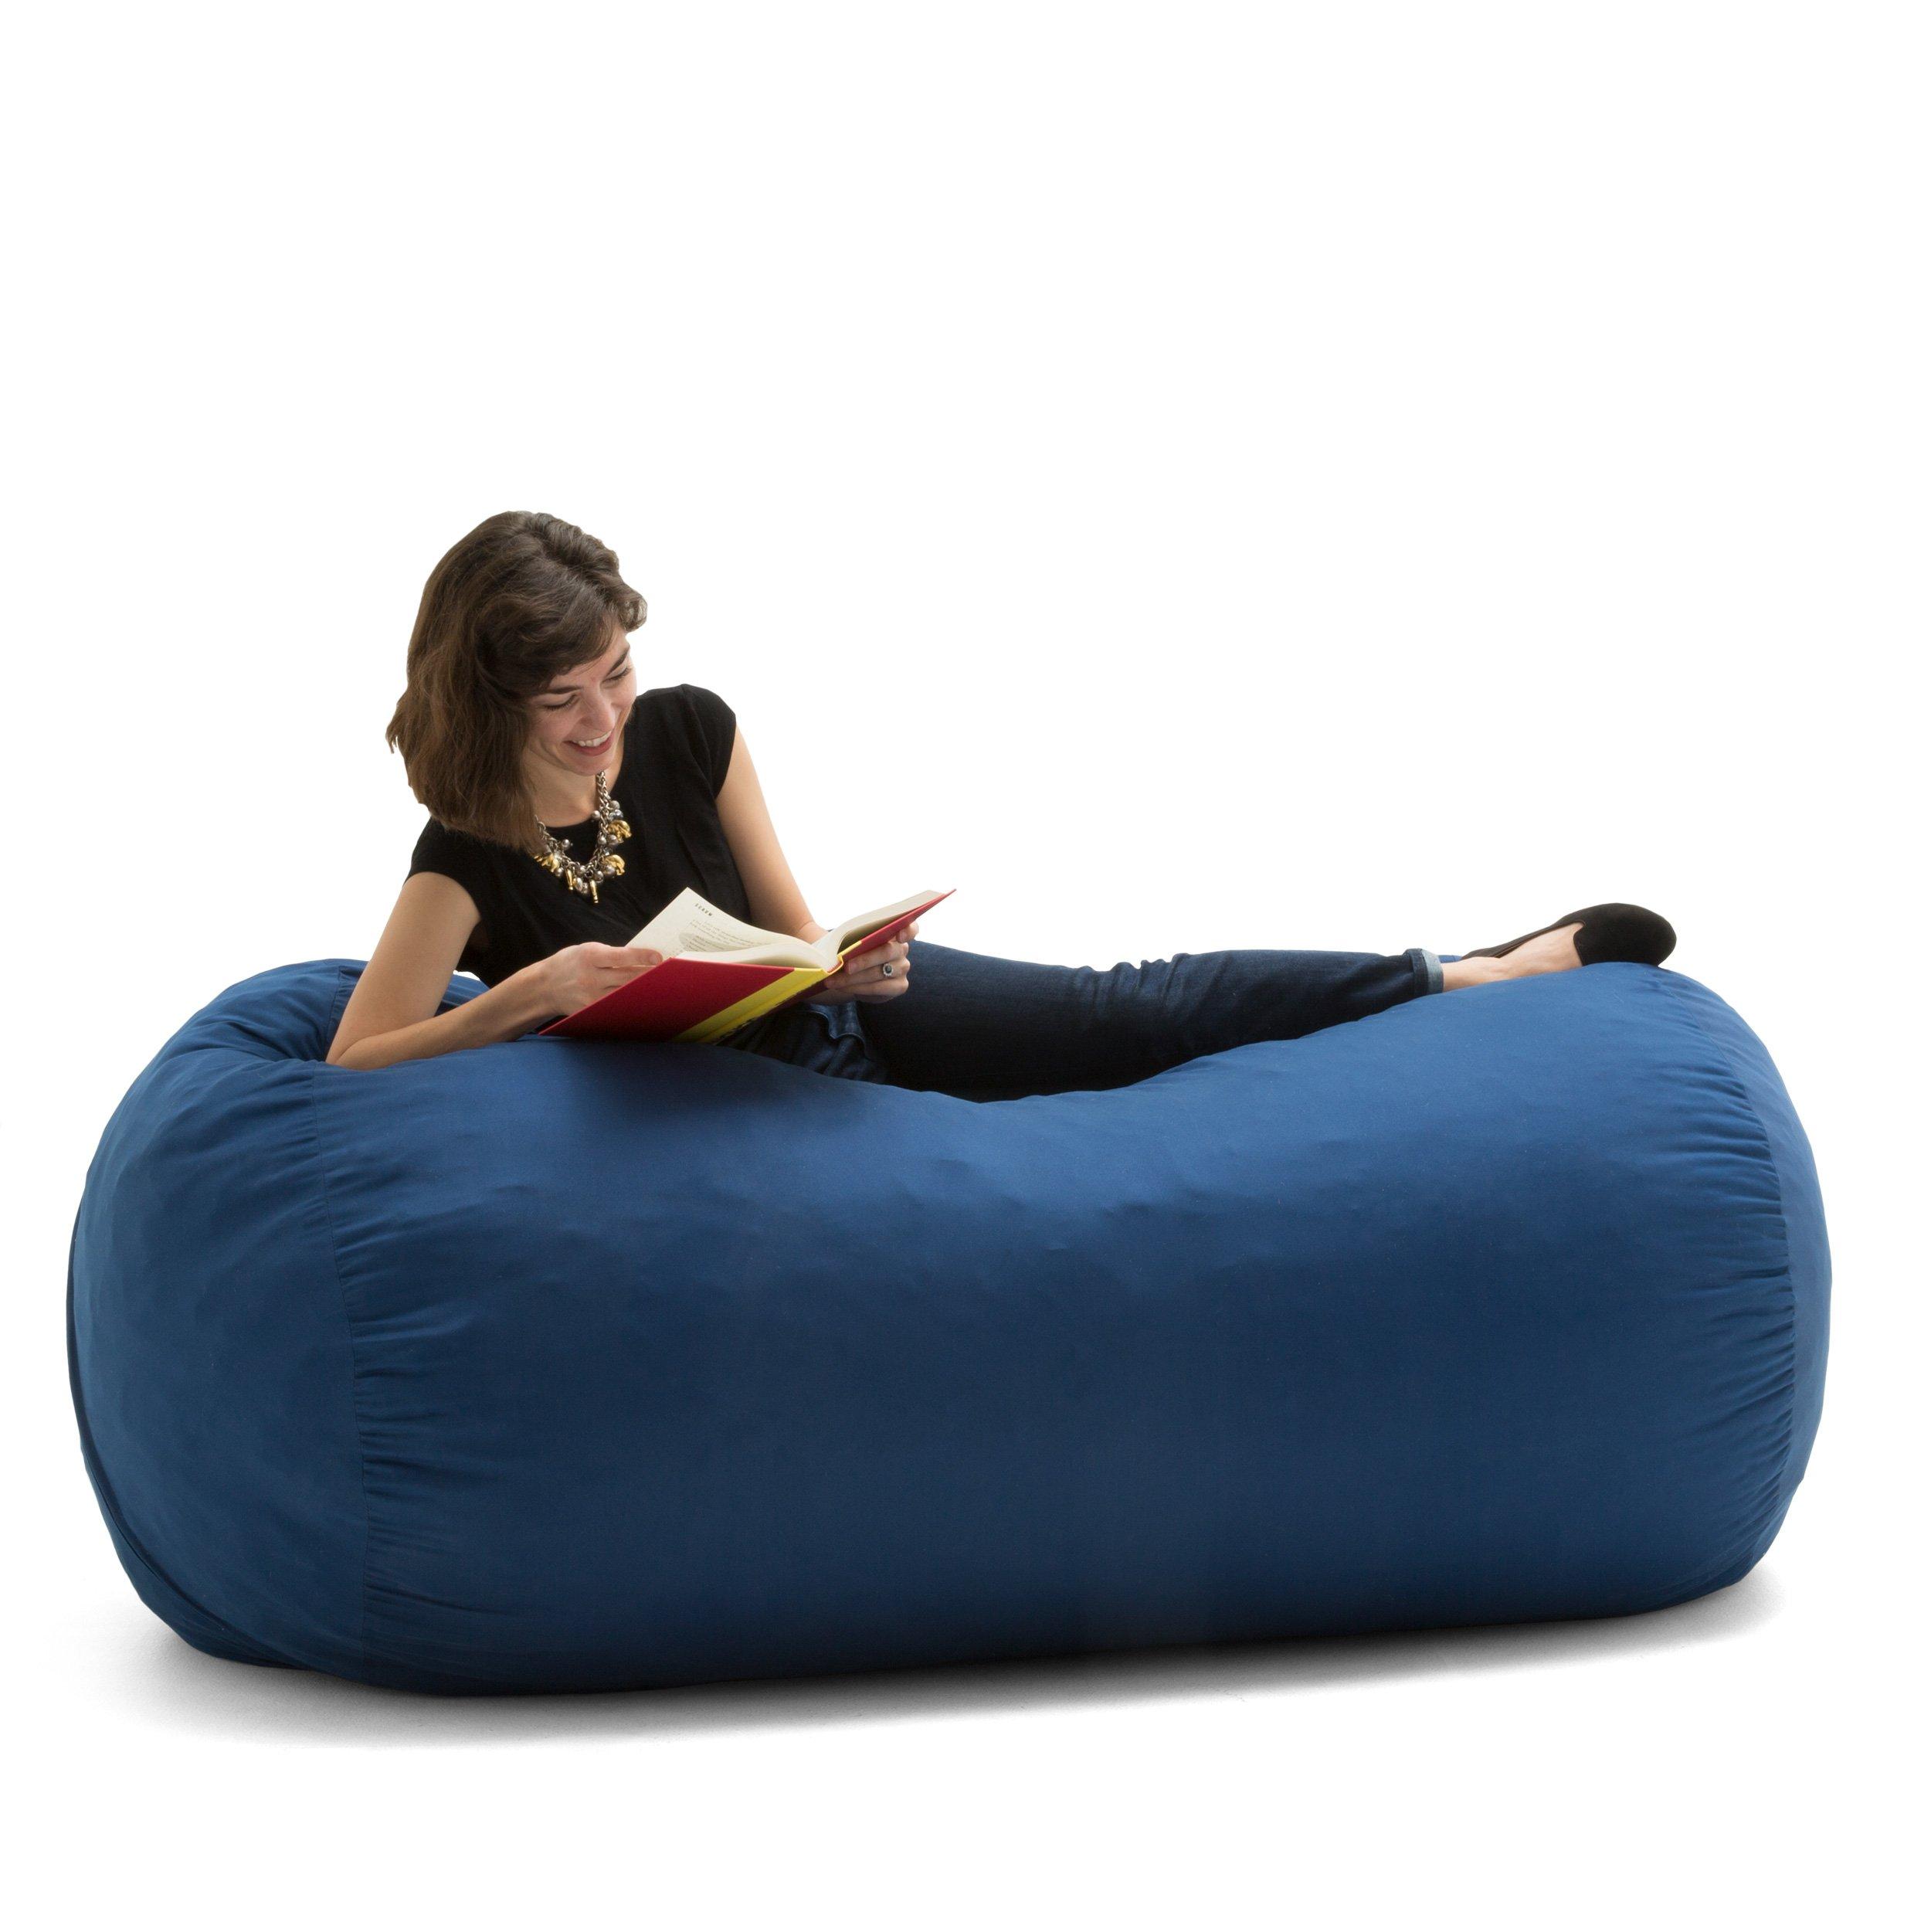 Big Joe Media Lounger Foam Filled Bean Bag Chair, Oxford Blue